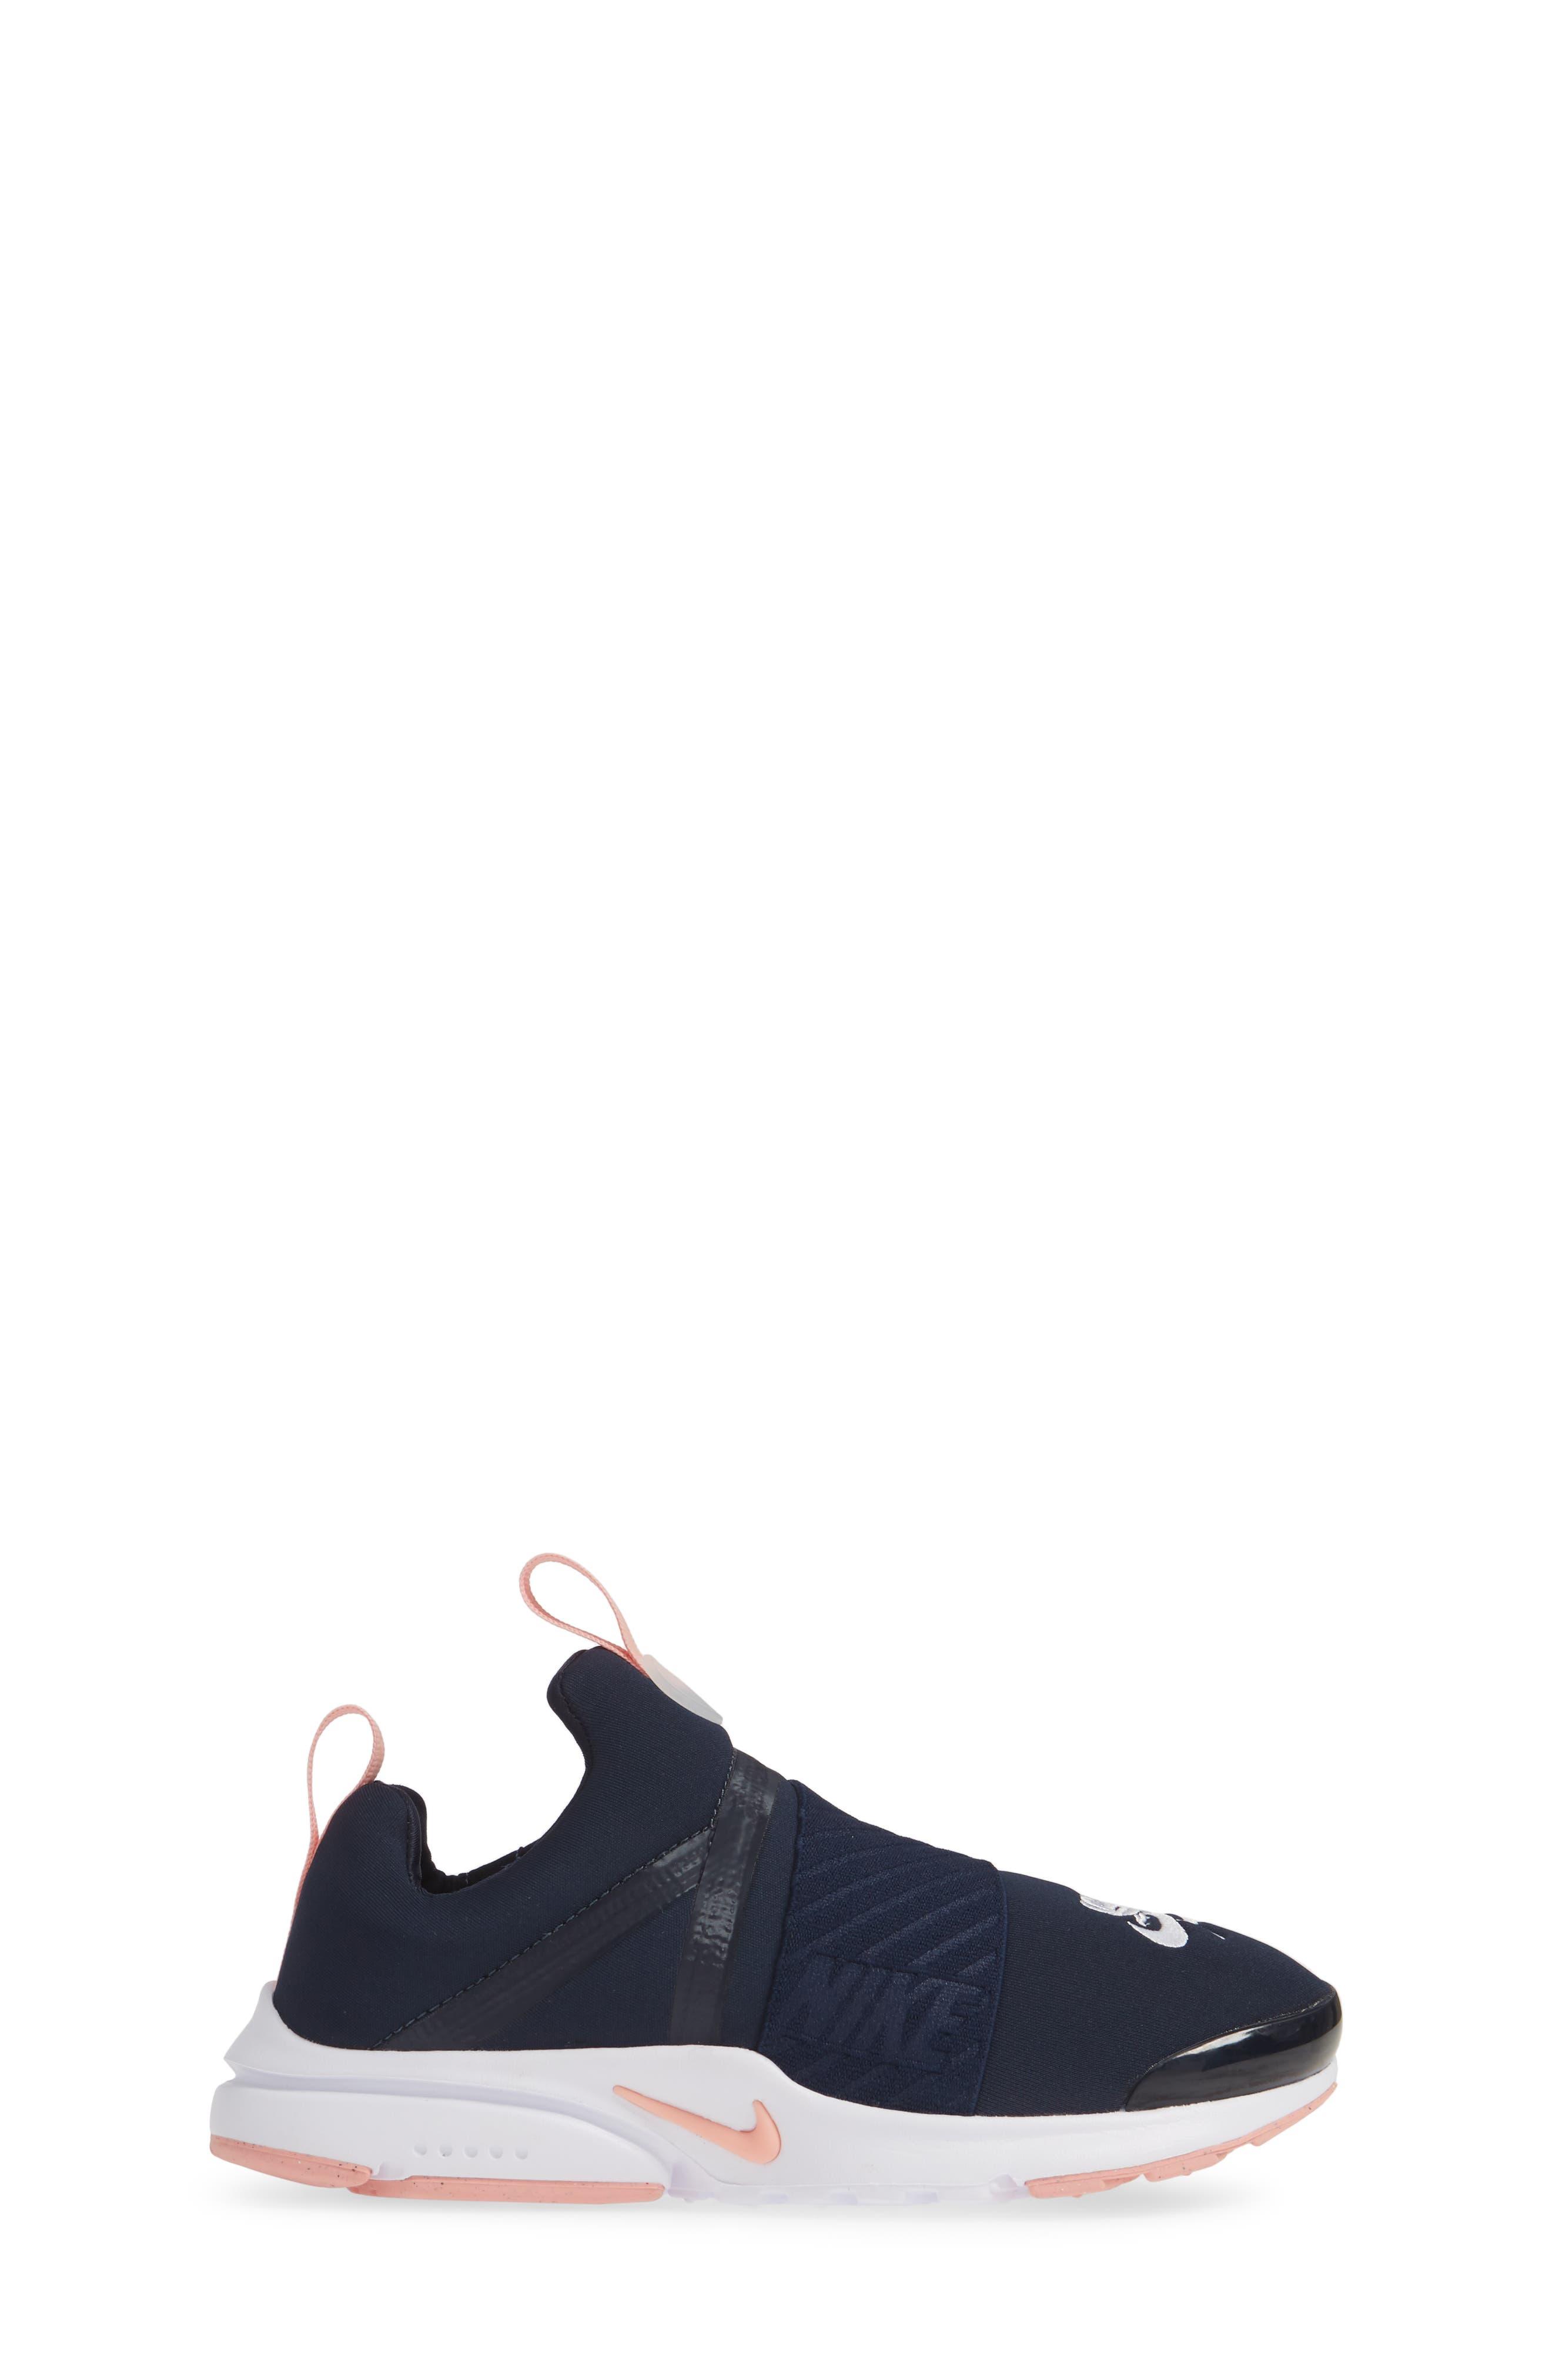 NIKE,                             Presto Extreme VDAY Sneaker,                             Alternate thumbnail 3, color,                             OBSIDIAN/ BLEACHED CORAL-WHITE